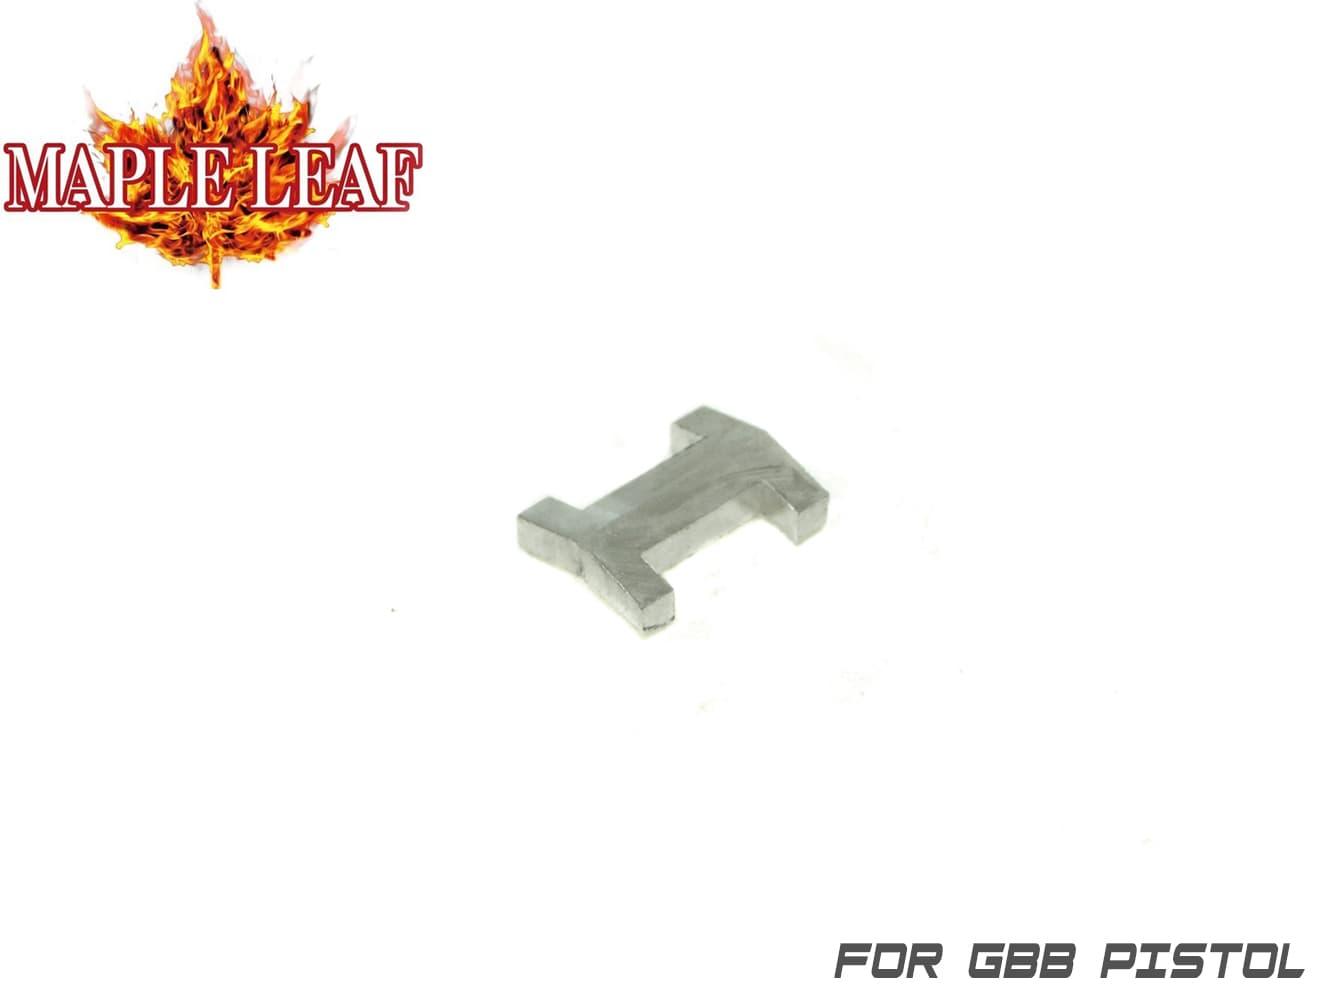 Maple Leaf HOPテンション強化パーツ I Key◆ホップ強化 ラウンドフラット形状 ホップ吐出量増大 長掛け強ホップ仕様 各社GBBハンドガン MONSTER/MACARONに対応